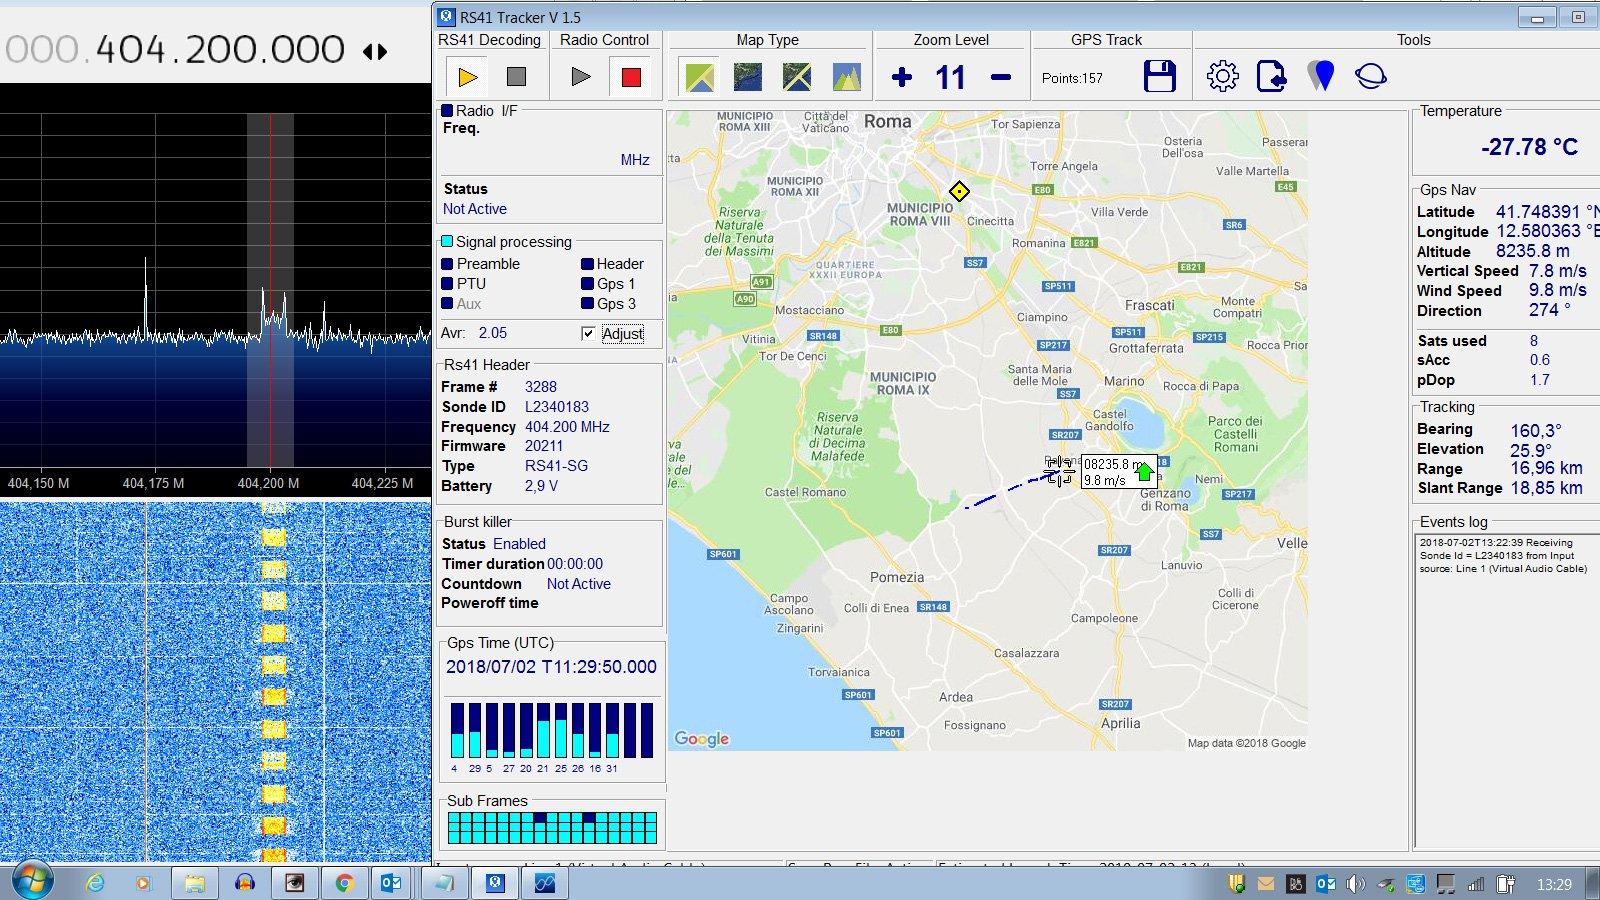 My first Radiosonde !! From Pratica di Mare received with Rtl Sdr with @sdrsharp & Rs41 Tracker @rtlsdrblog @rtlsdrblog @Chris_Diemoz @dxcoffee @uhf_satcom @EA4UC @ik1yde https://t.co/jWwok9aQgD